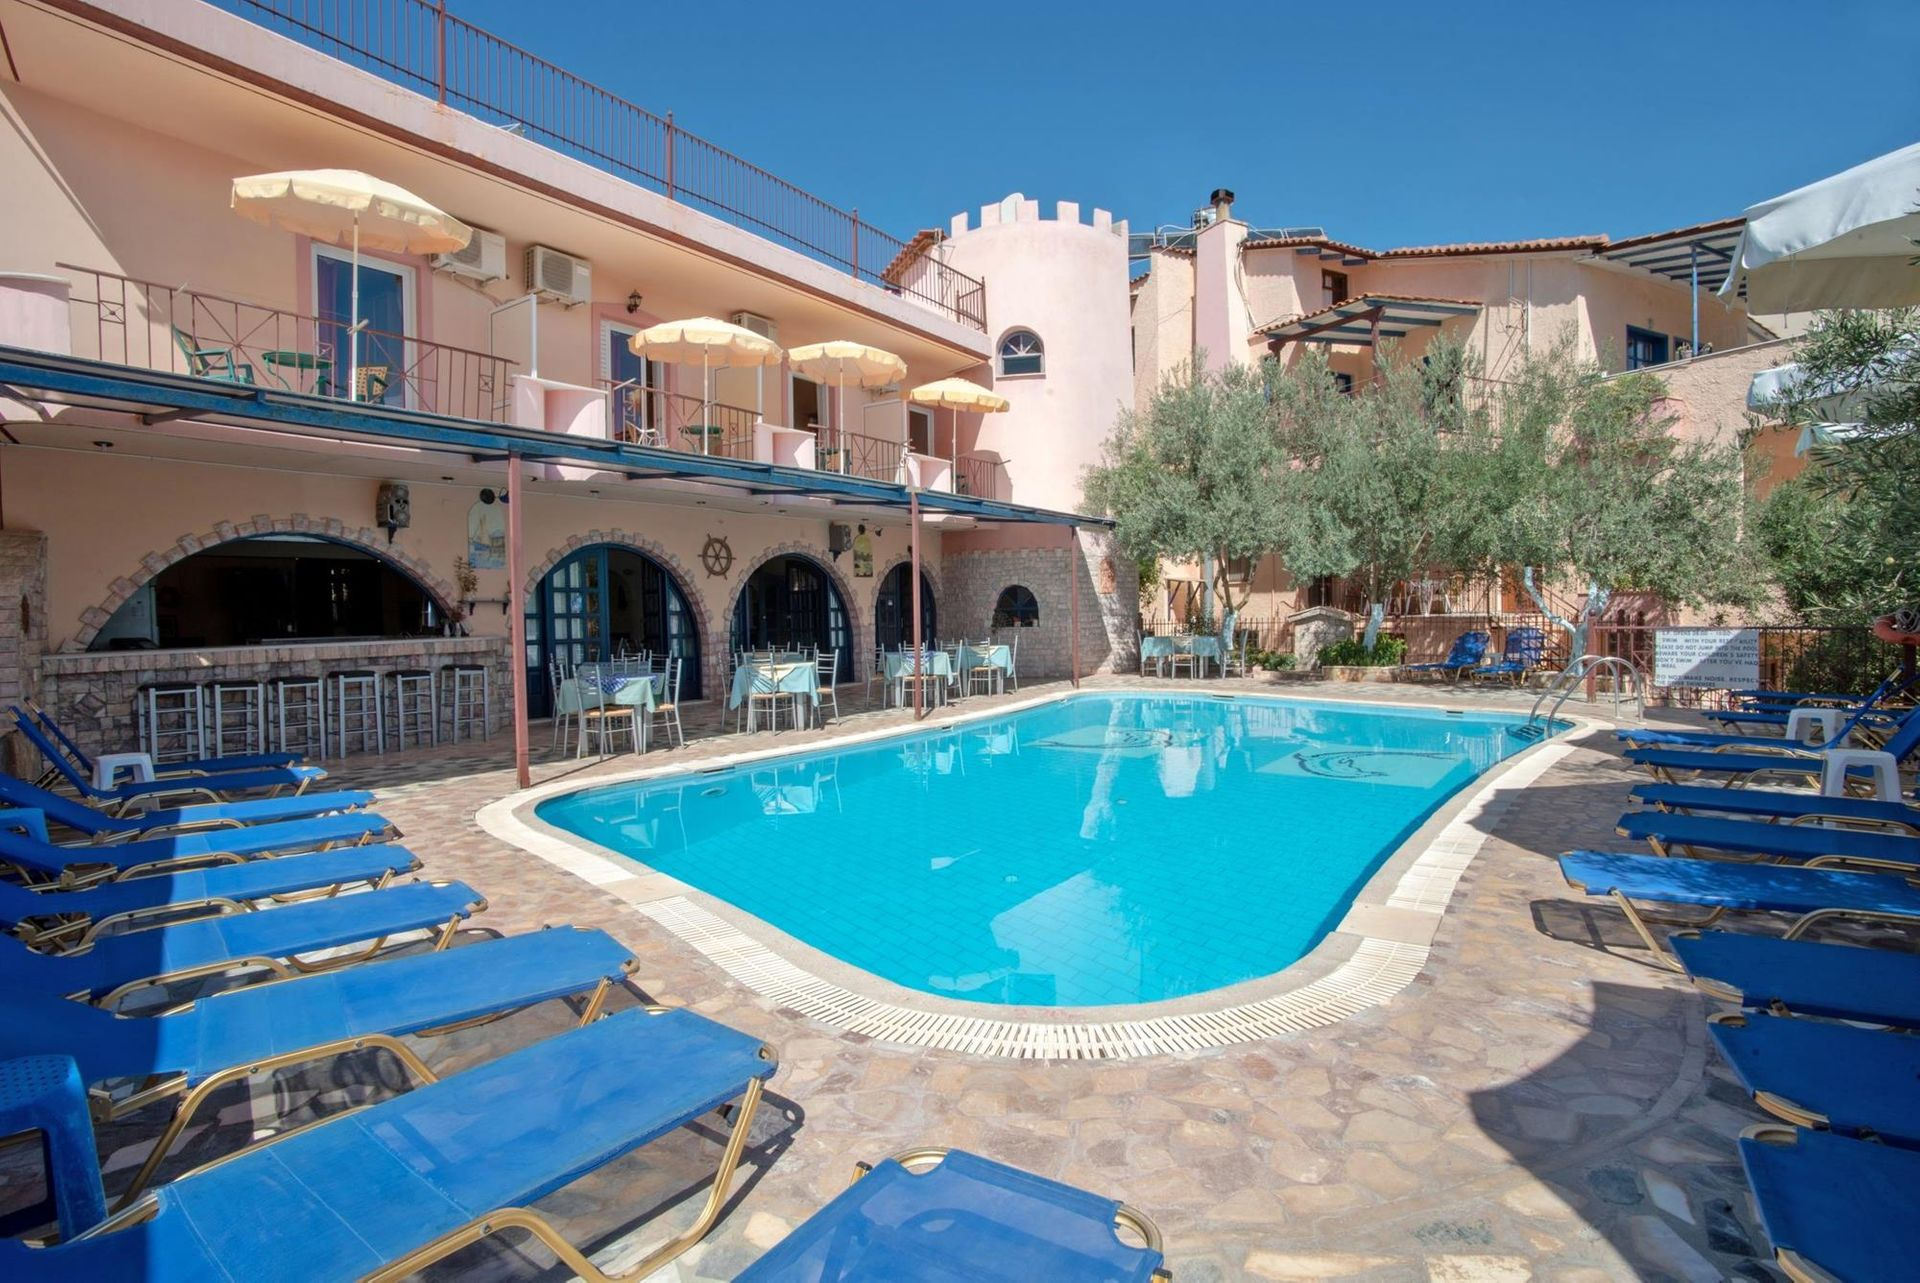 Kleoni Hotel & Apartments Tolo - Τολό ✦ 4 Ημέρες (3 Διανυκτερεύσεις) ✦ 2 άτομα ✦ Χωρίς Πρωινό ✦ 01/09/2021 έως 30/09/2021 ✦ Κοντά σε Παραλία!